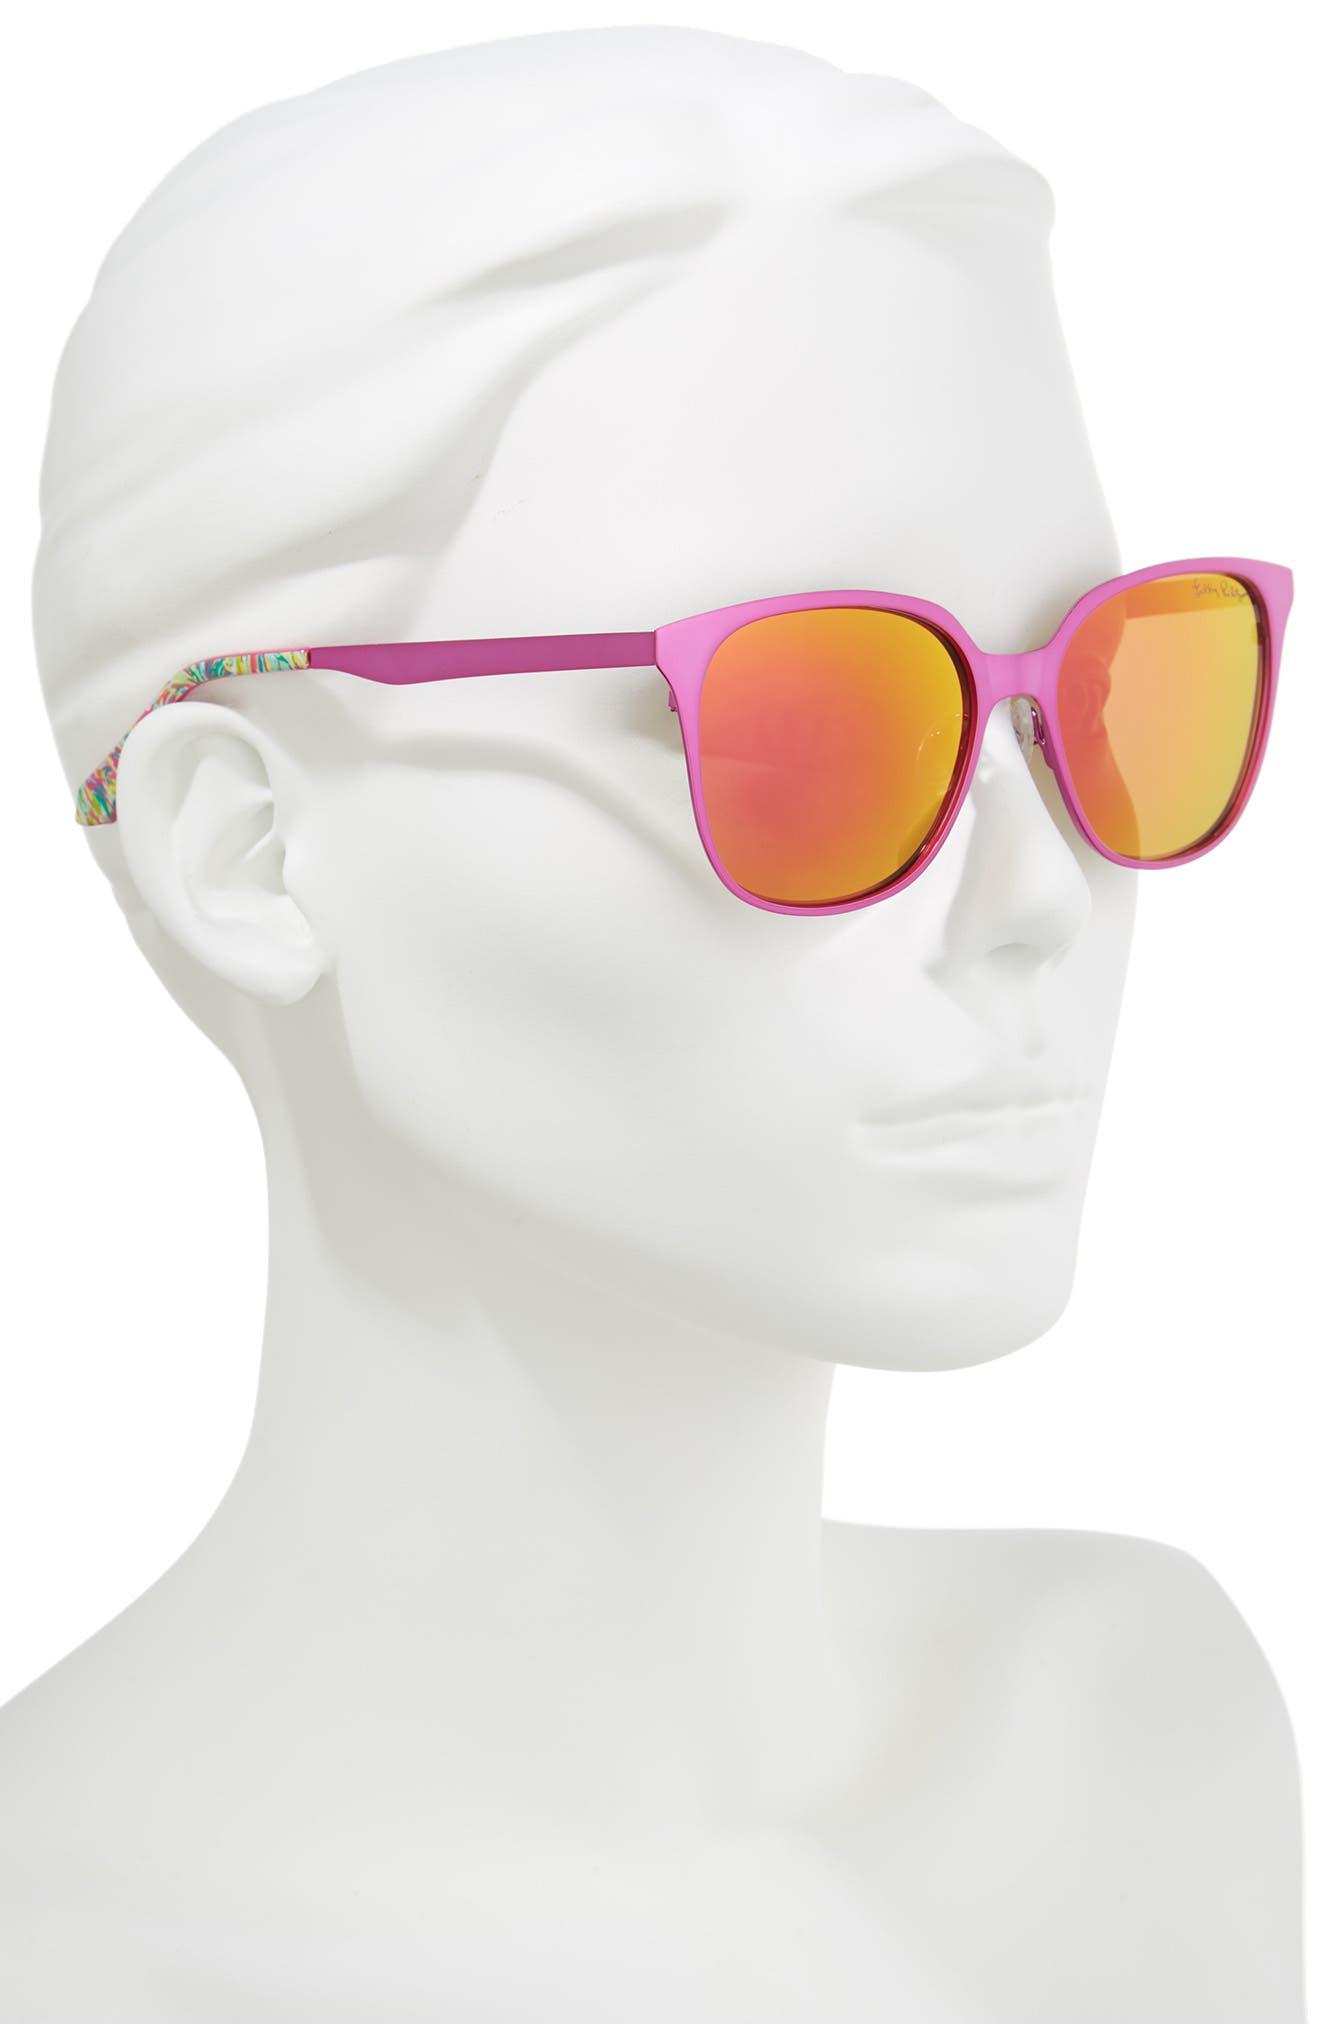 Landon 54mm Polarized Sunglasses,                             Alternate thumbnail 2, color,                             PINK/ PINK